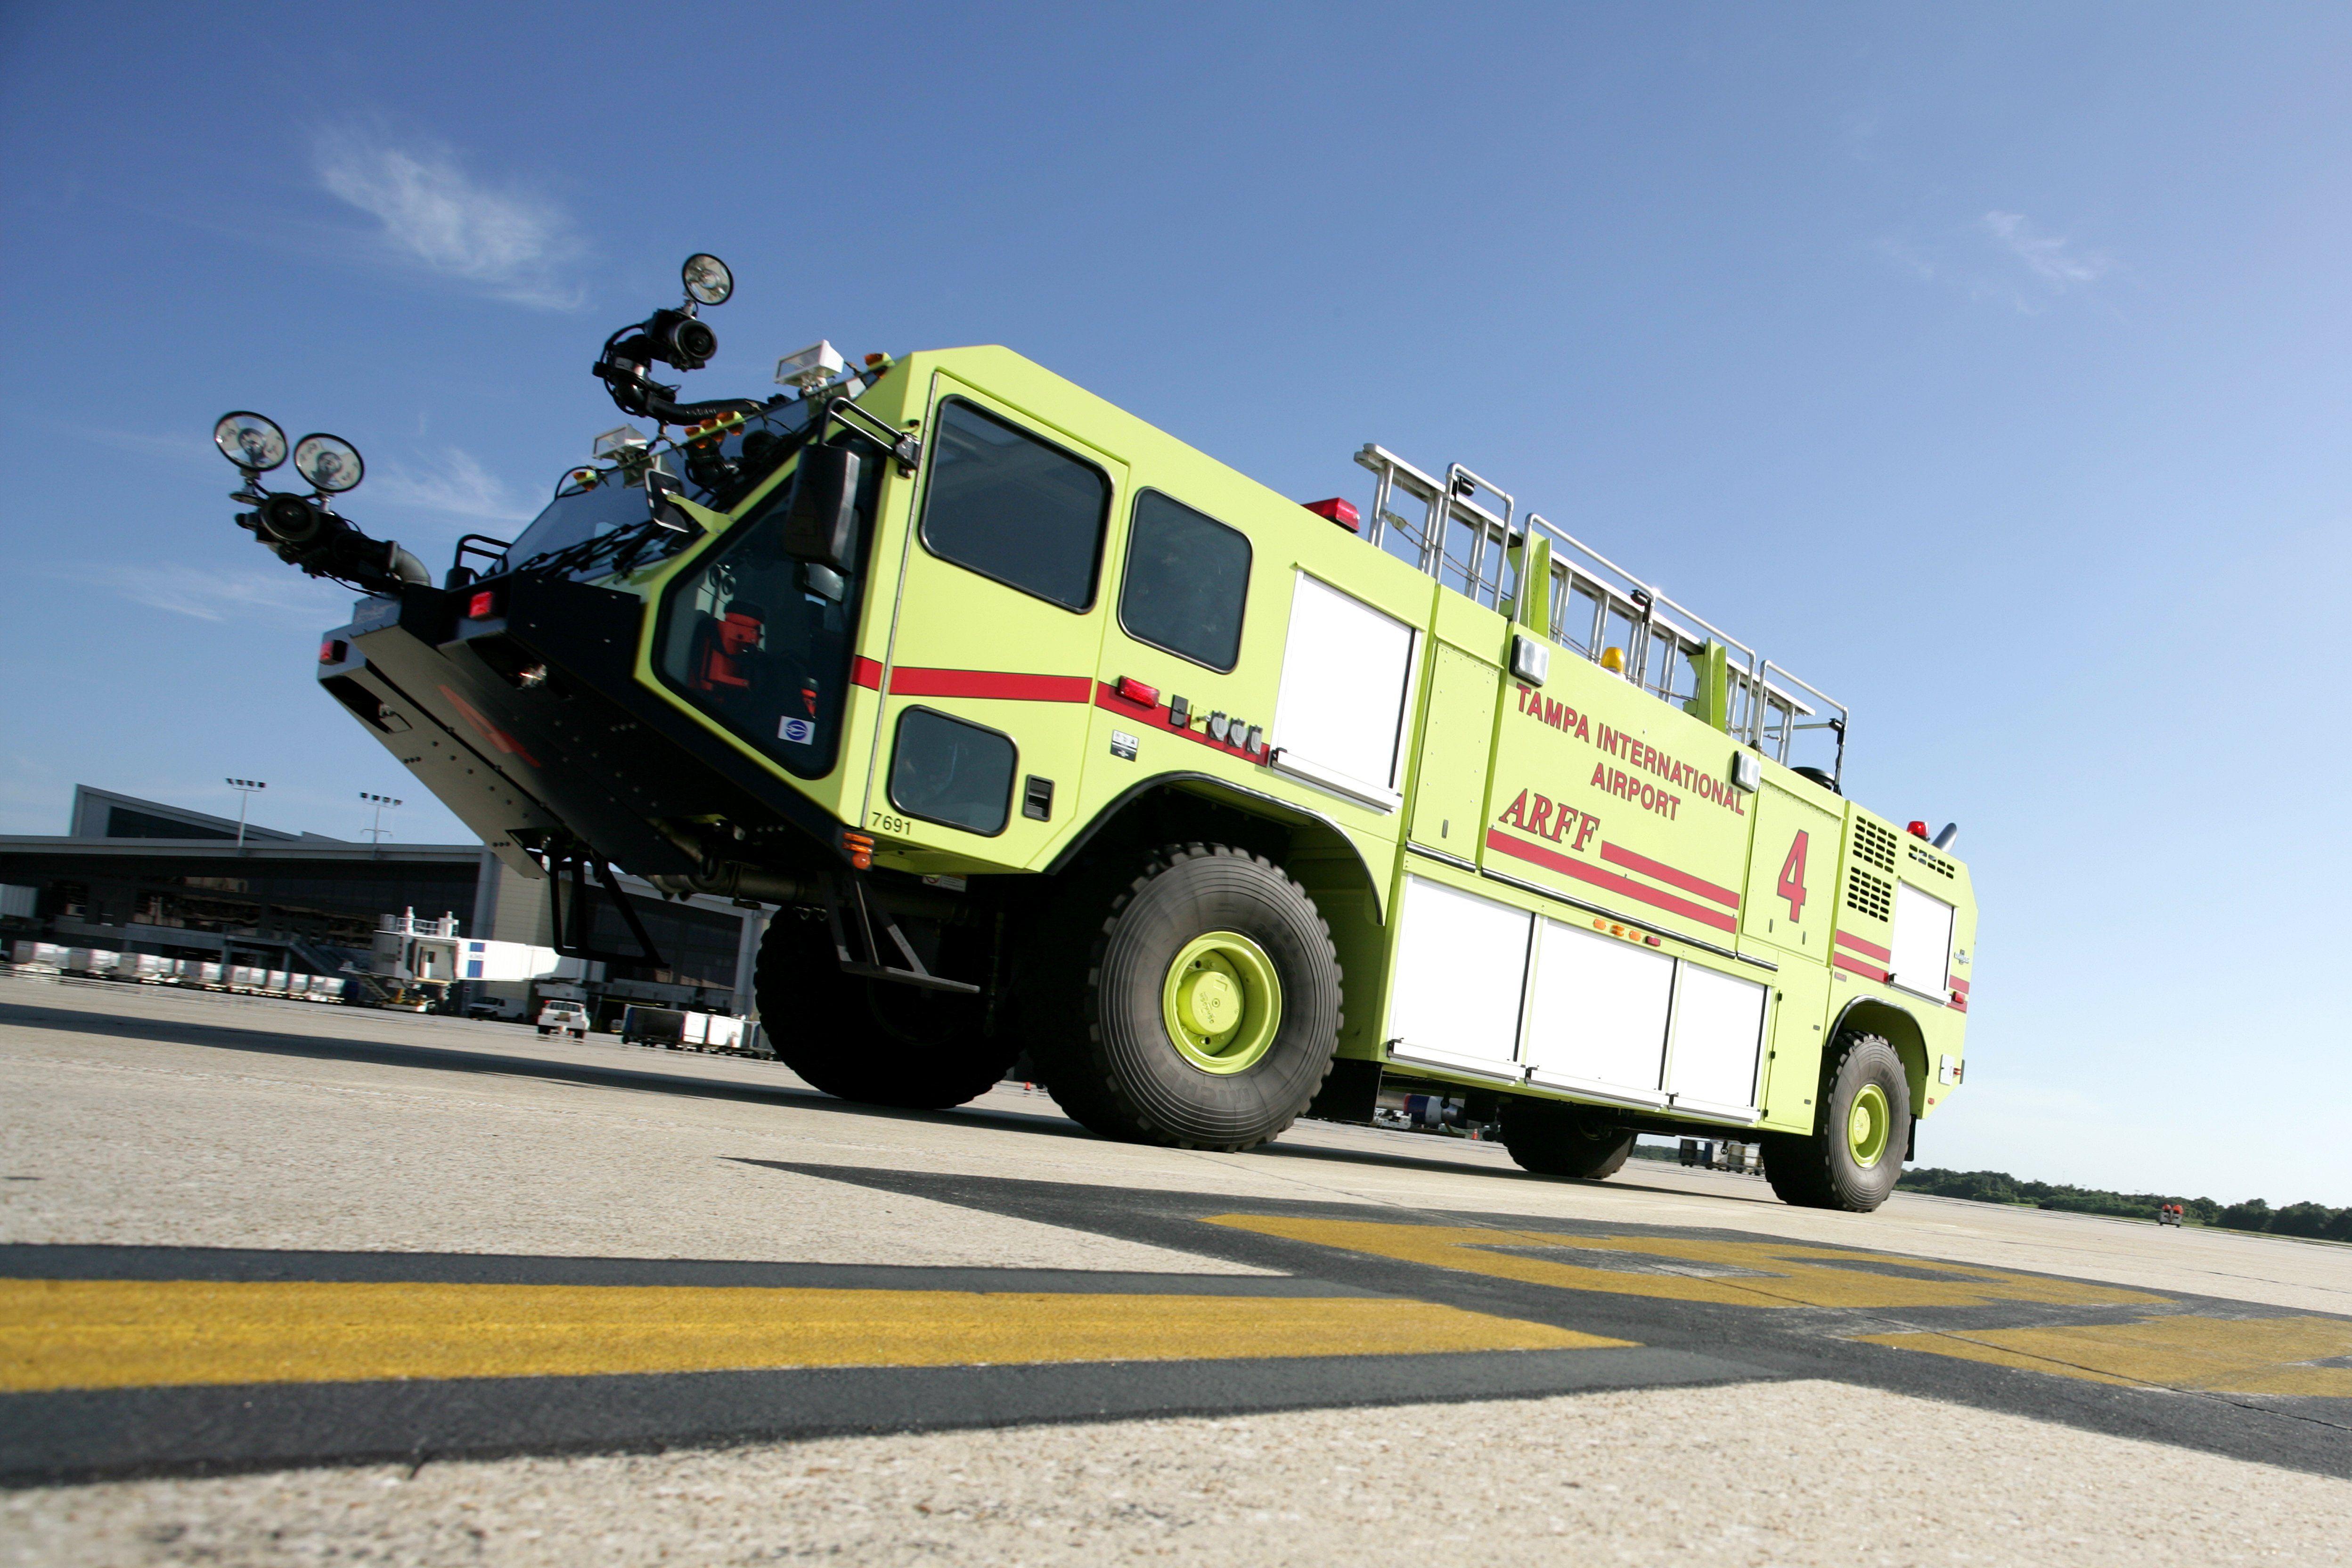 Tampa ARFF Truck on the tarmac in Florida. Fire trucks